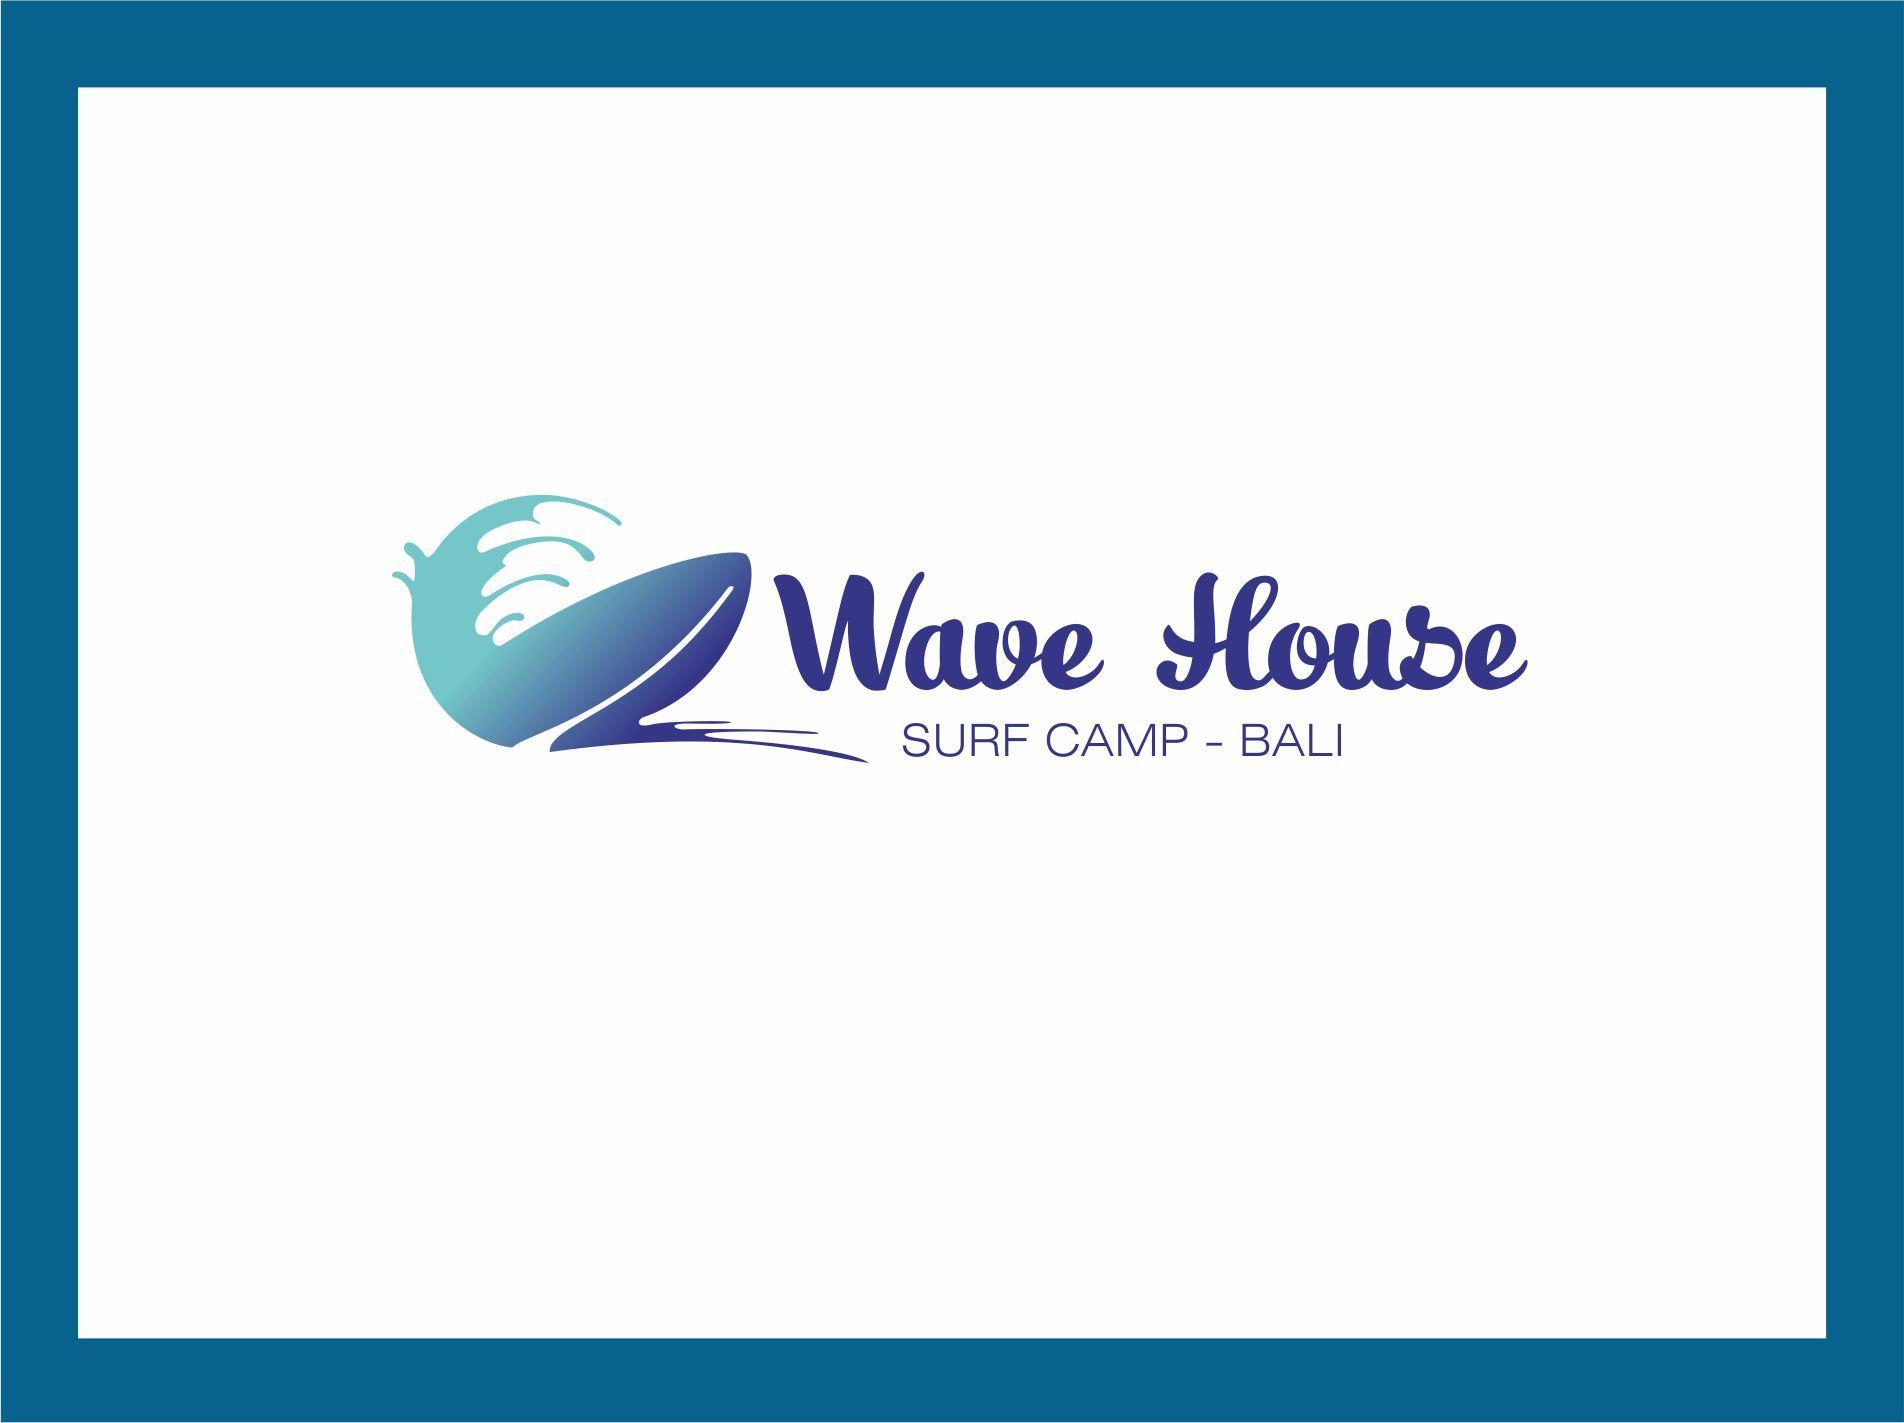 Редизайн логотипа для серф-кэмпа на Бали - дизайнер Re-gi-na